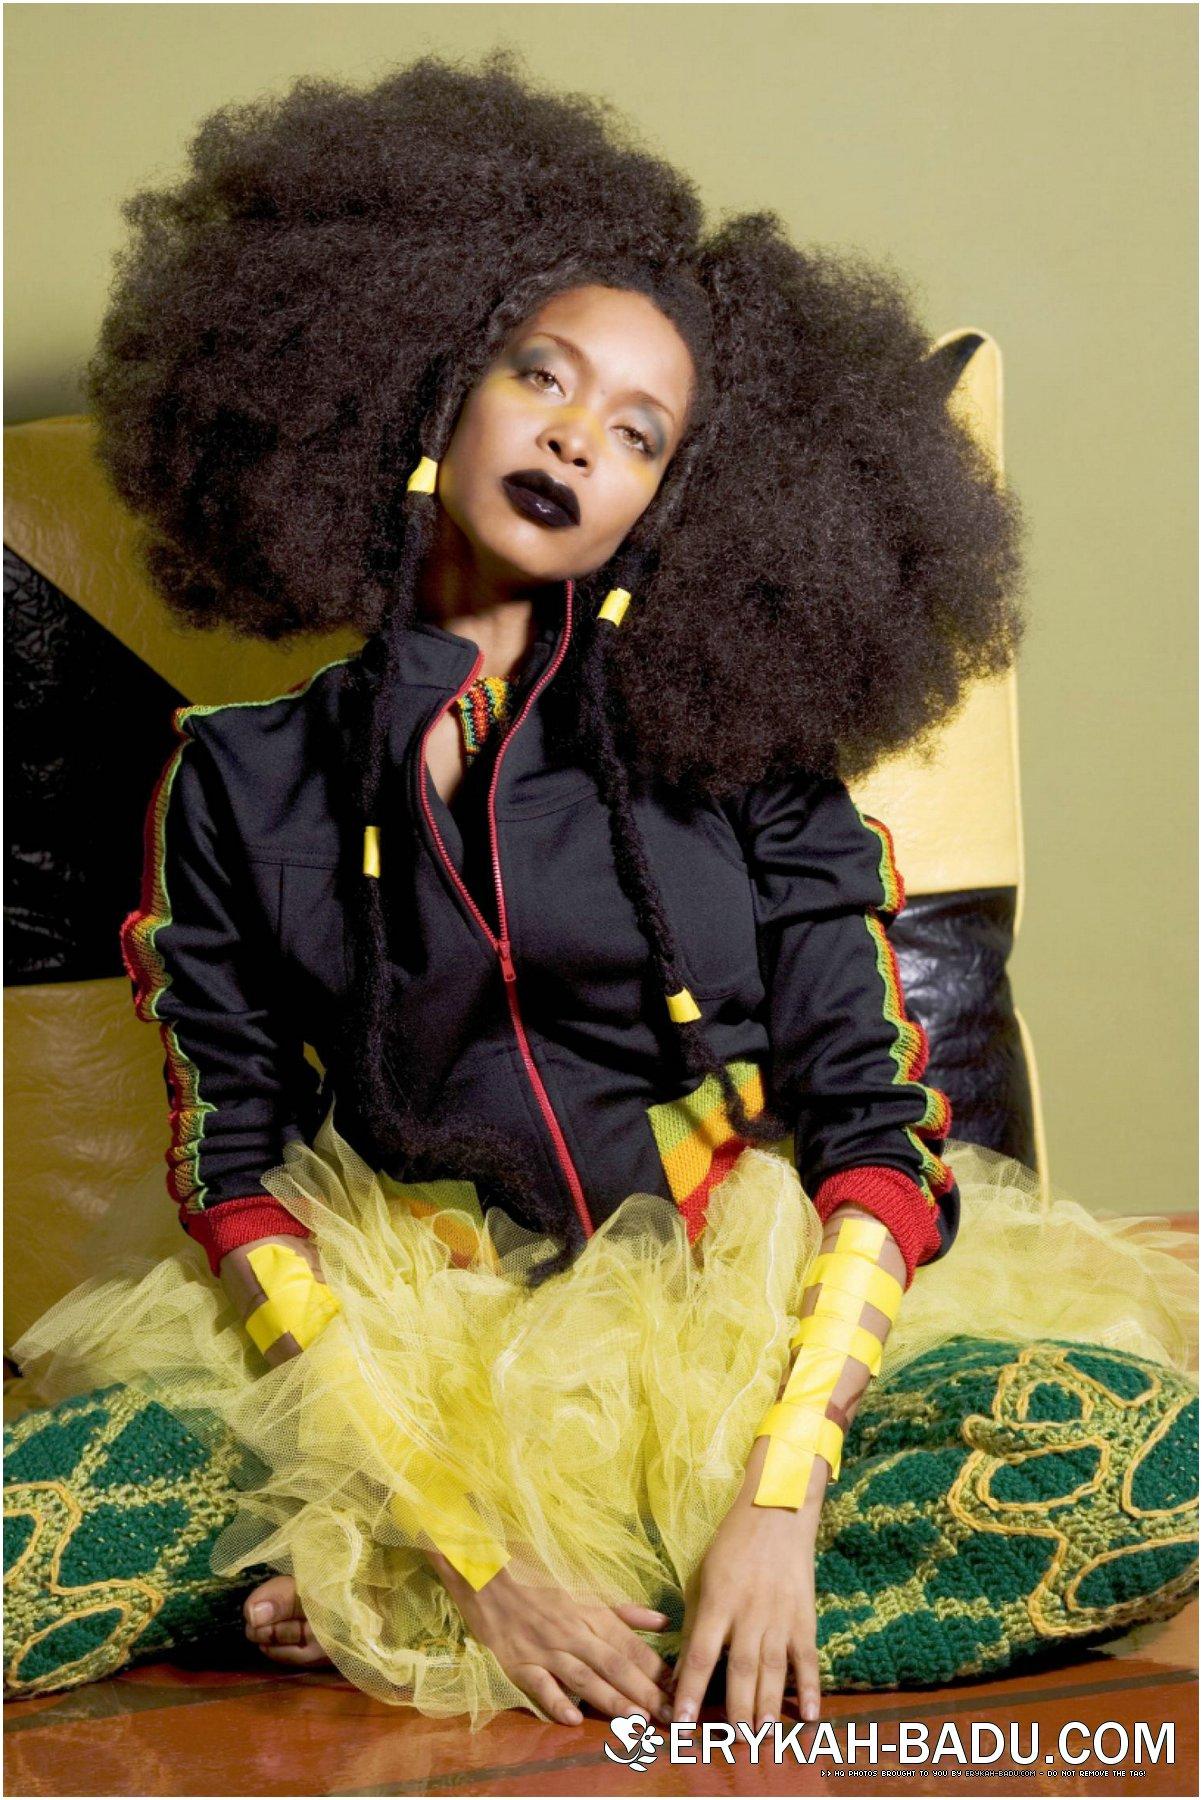 Erykah Badu Natural Hair